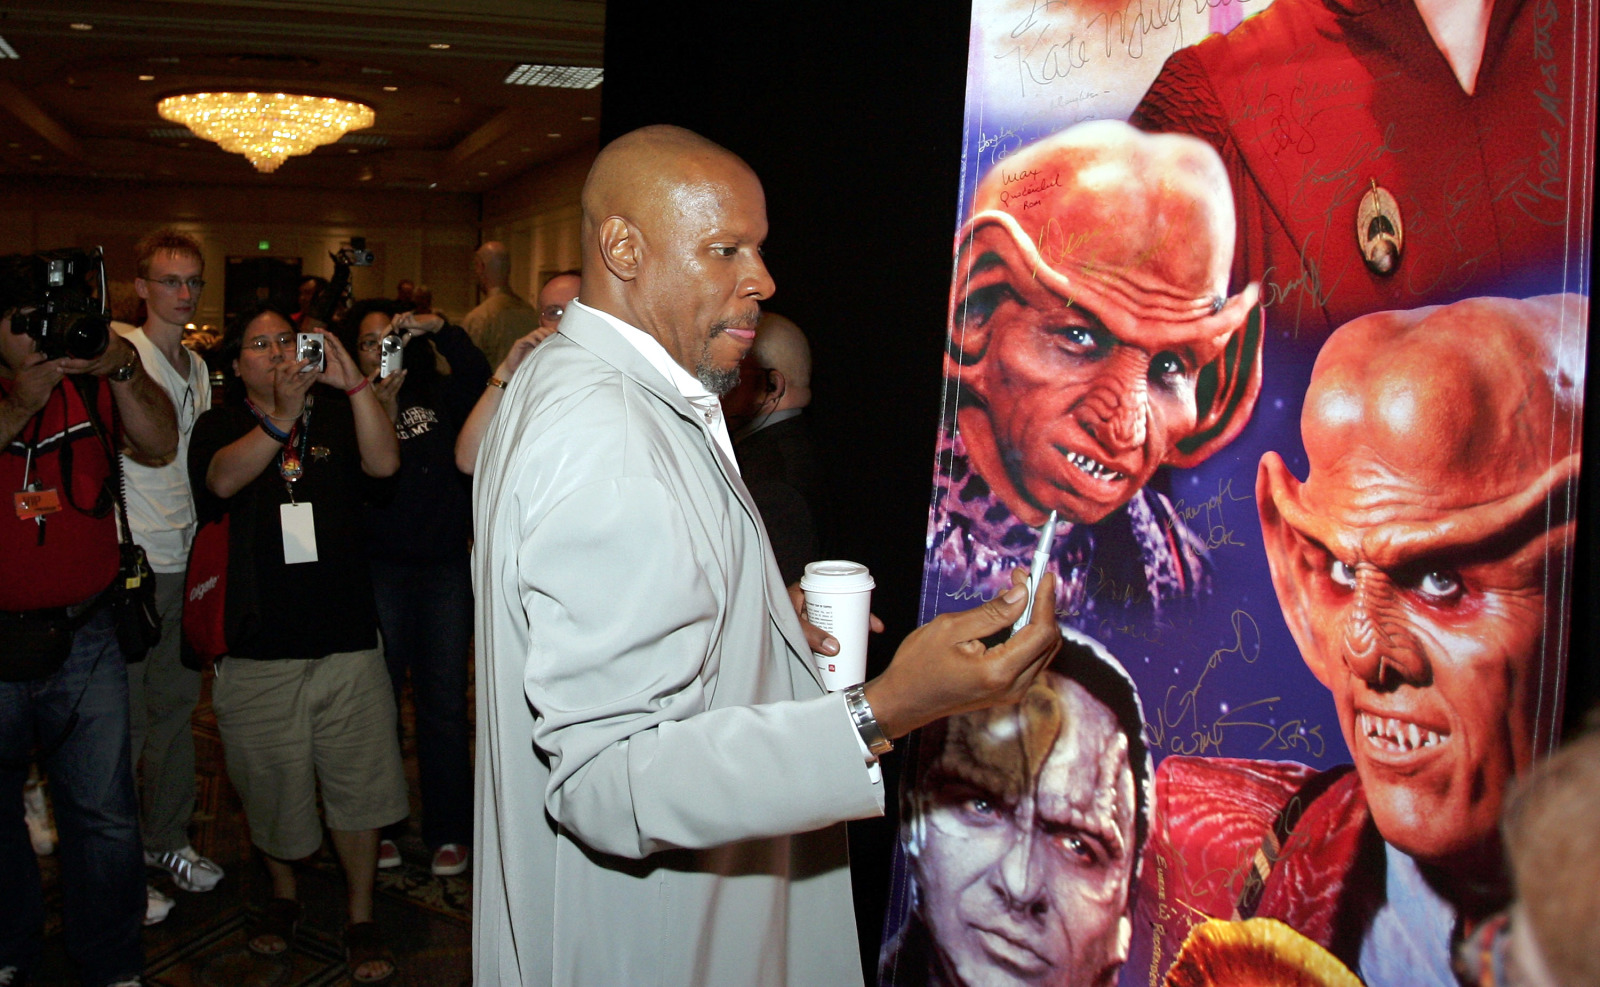 Obviously, Star Trek fans totally support Captain Sisko's illegal ways